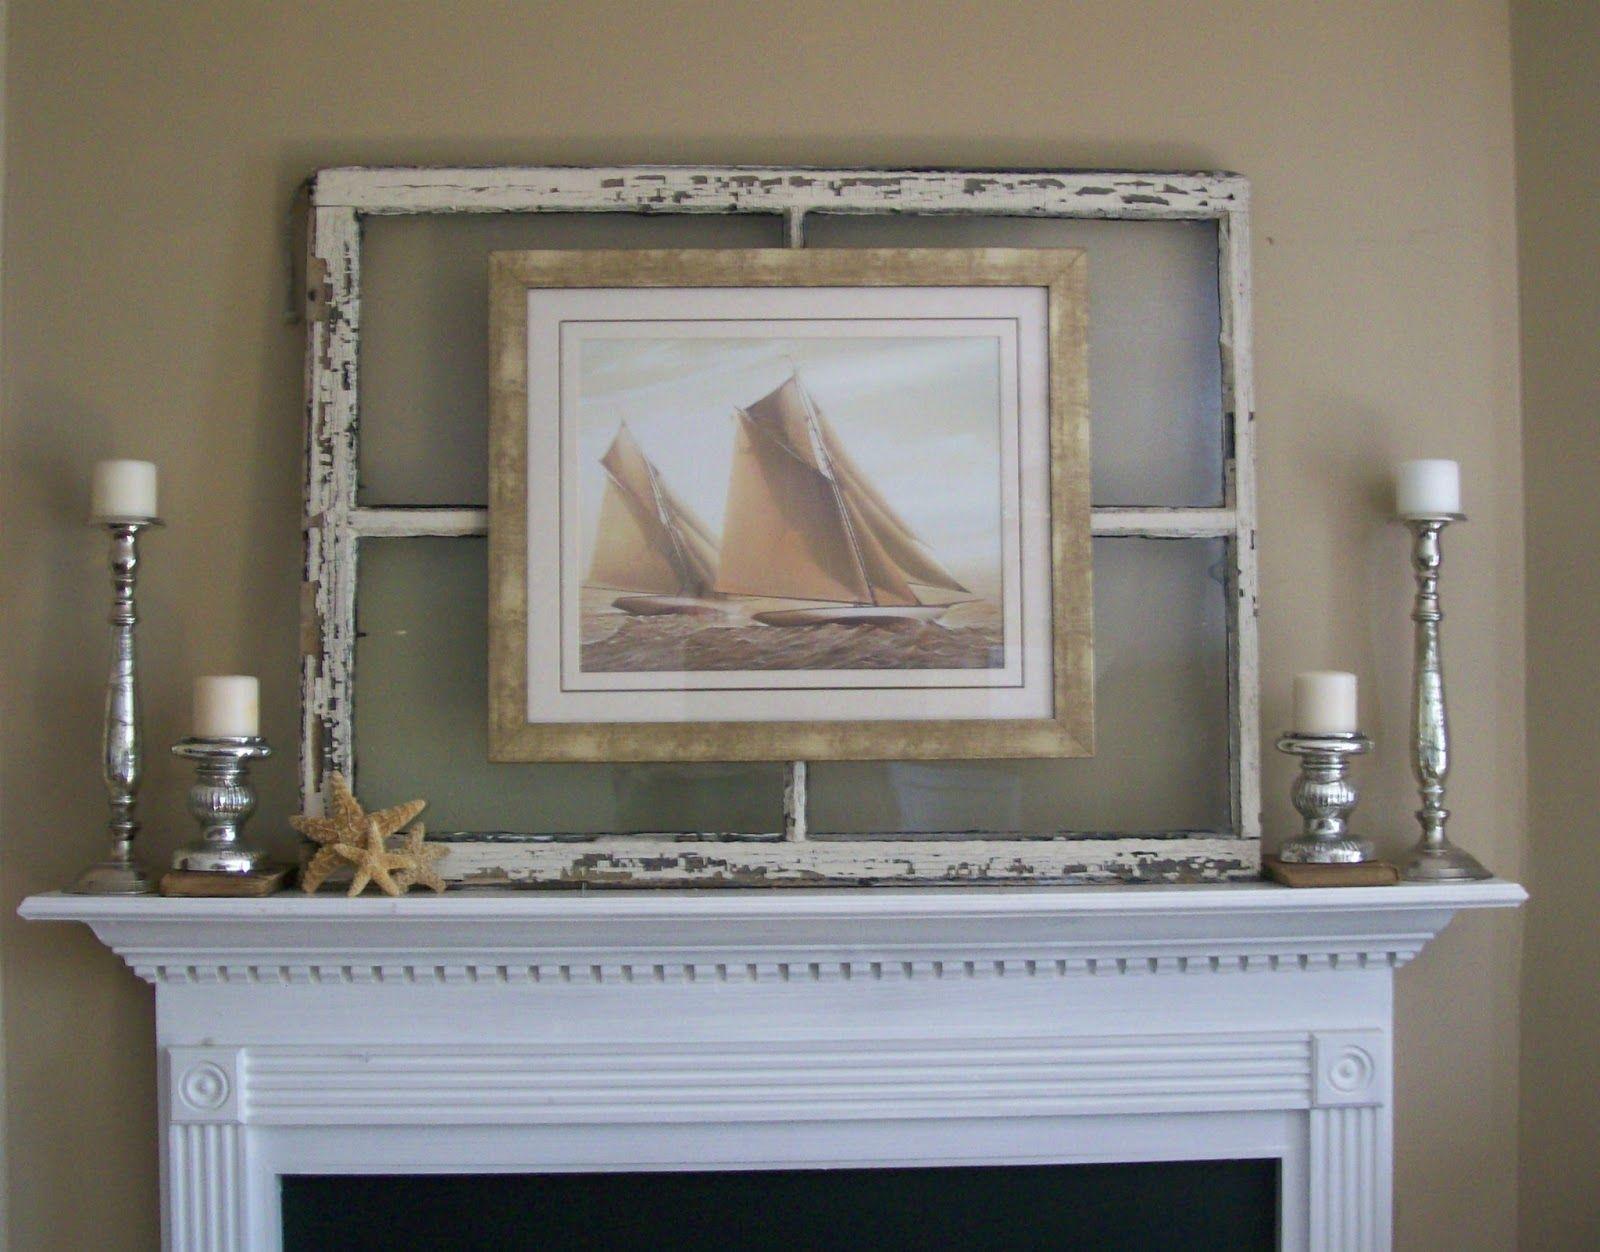 walnut and vine hang a photo or art print on an old mirror via window frame - Window Frame Wall Art